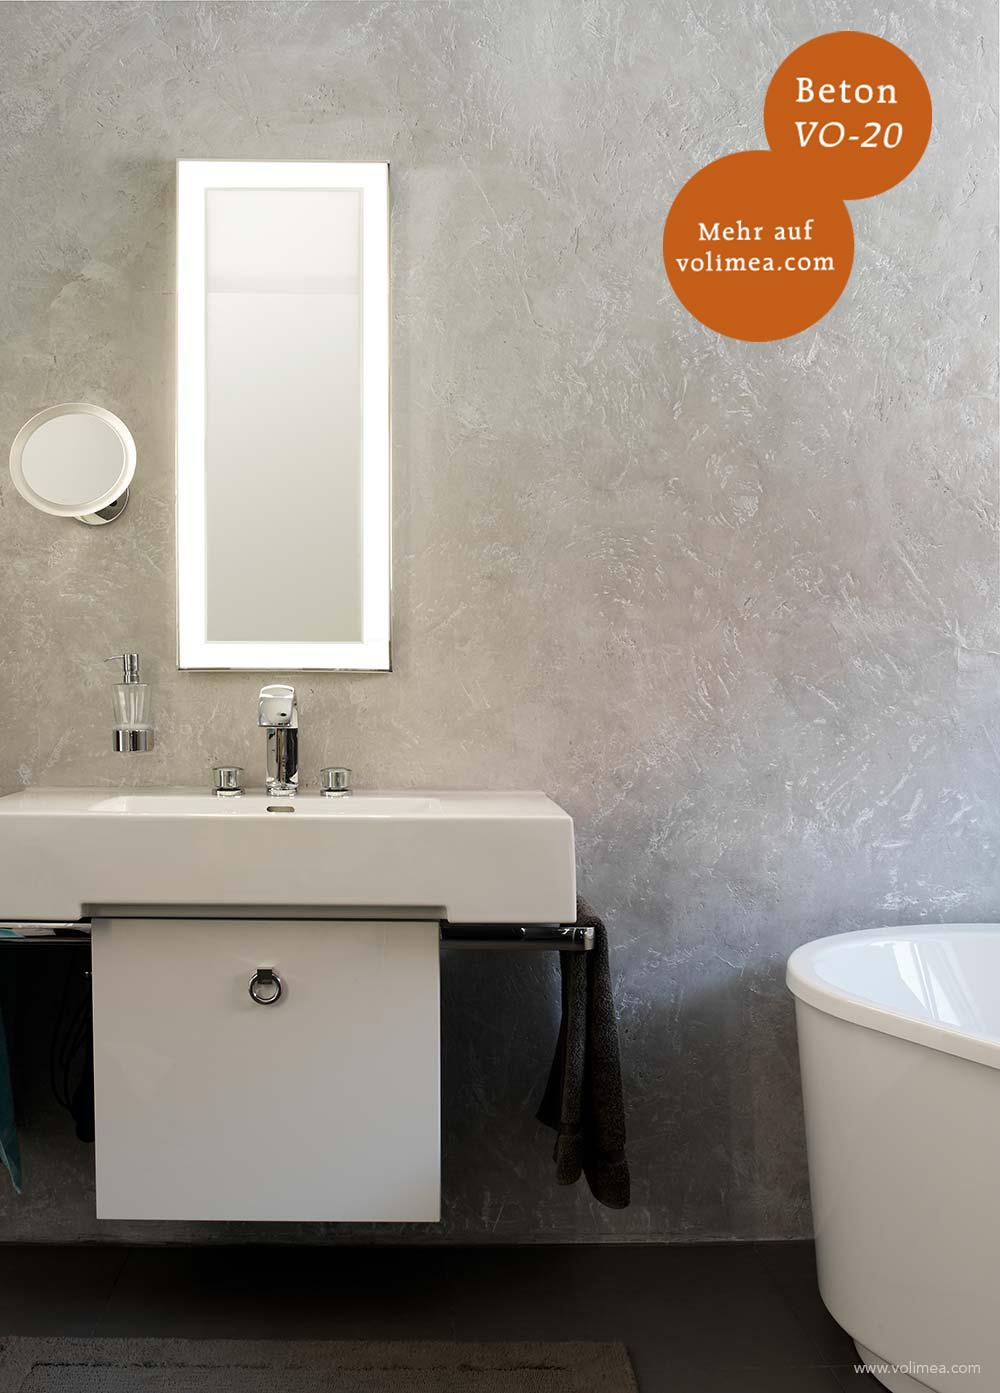 Mikrozement fugenlose Volimea Wandbeschichtung im Badezimmer - Beton VO-20